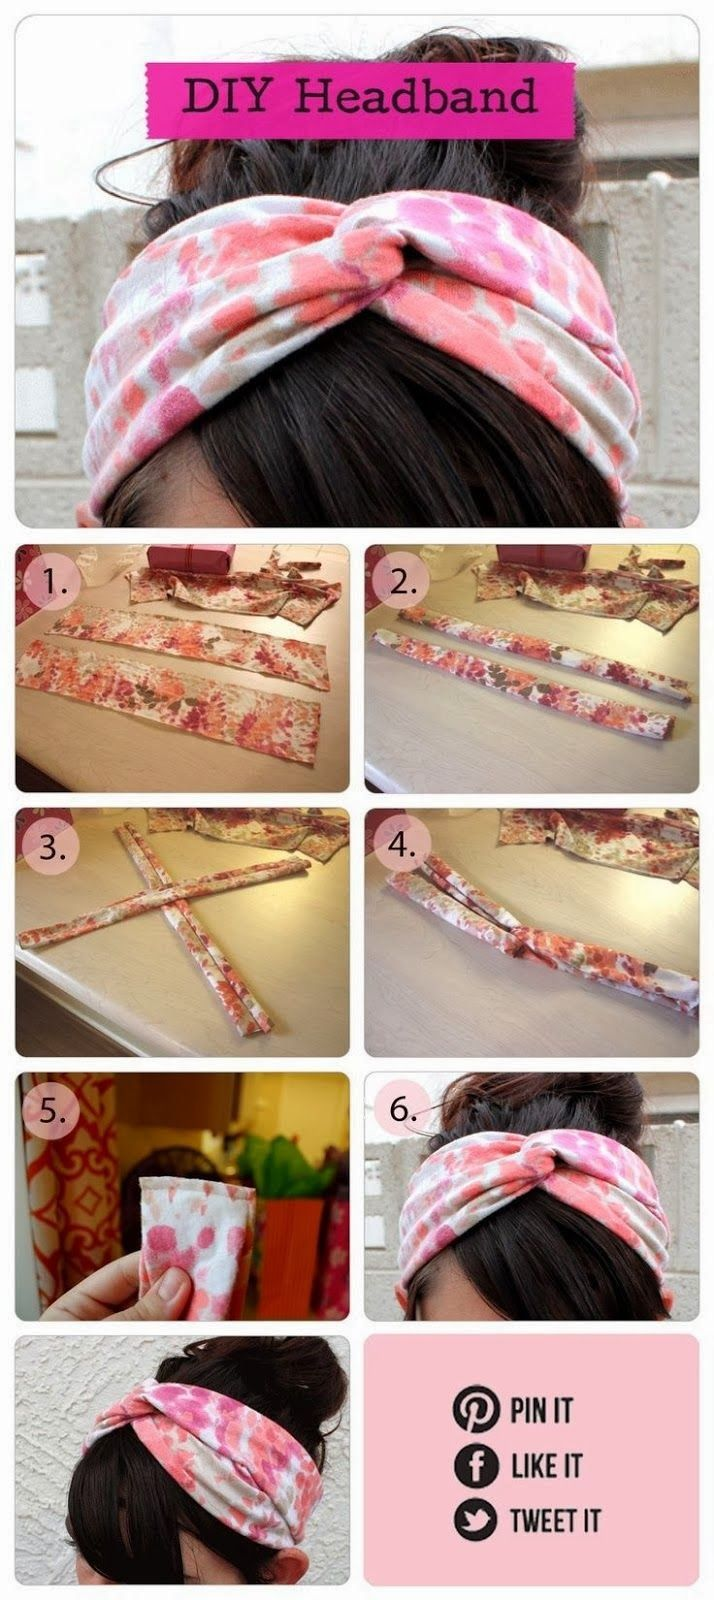 Easy diy crafts diy headband cute with a lighter